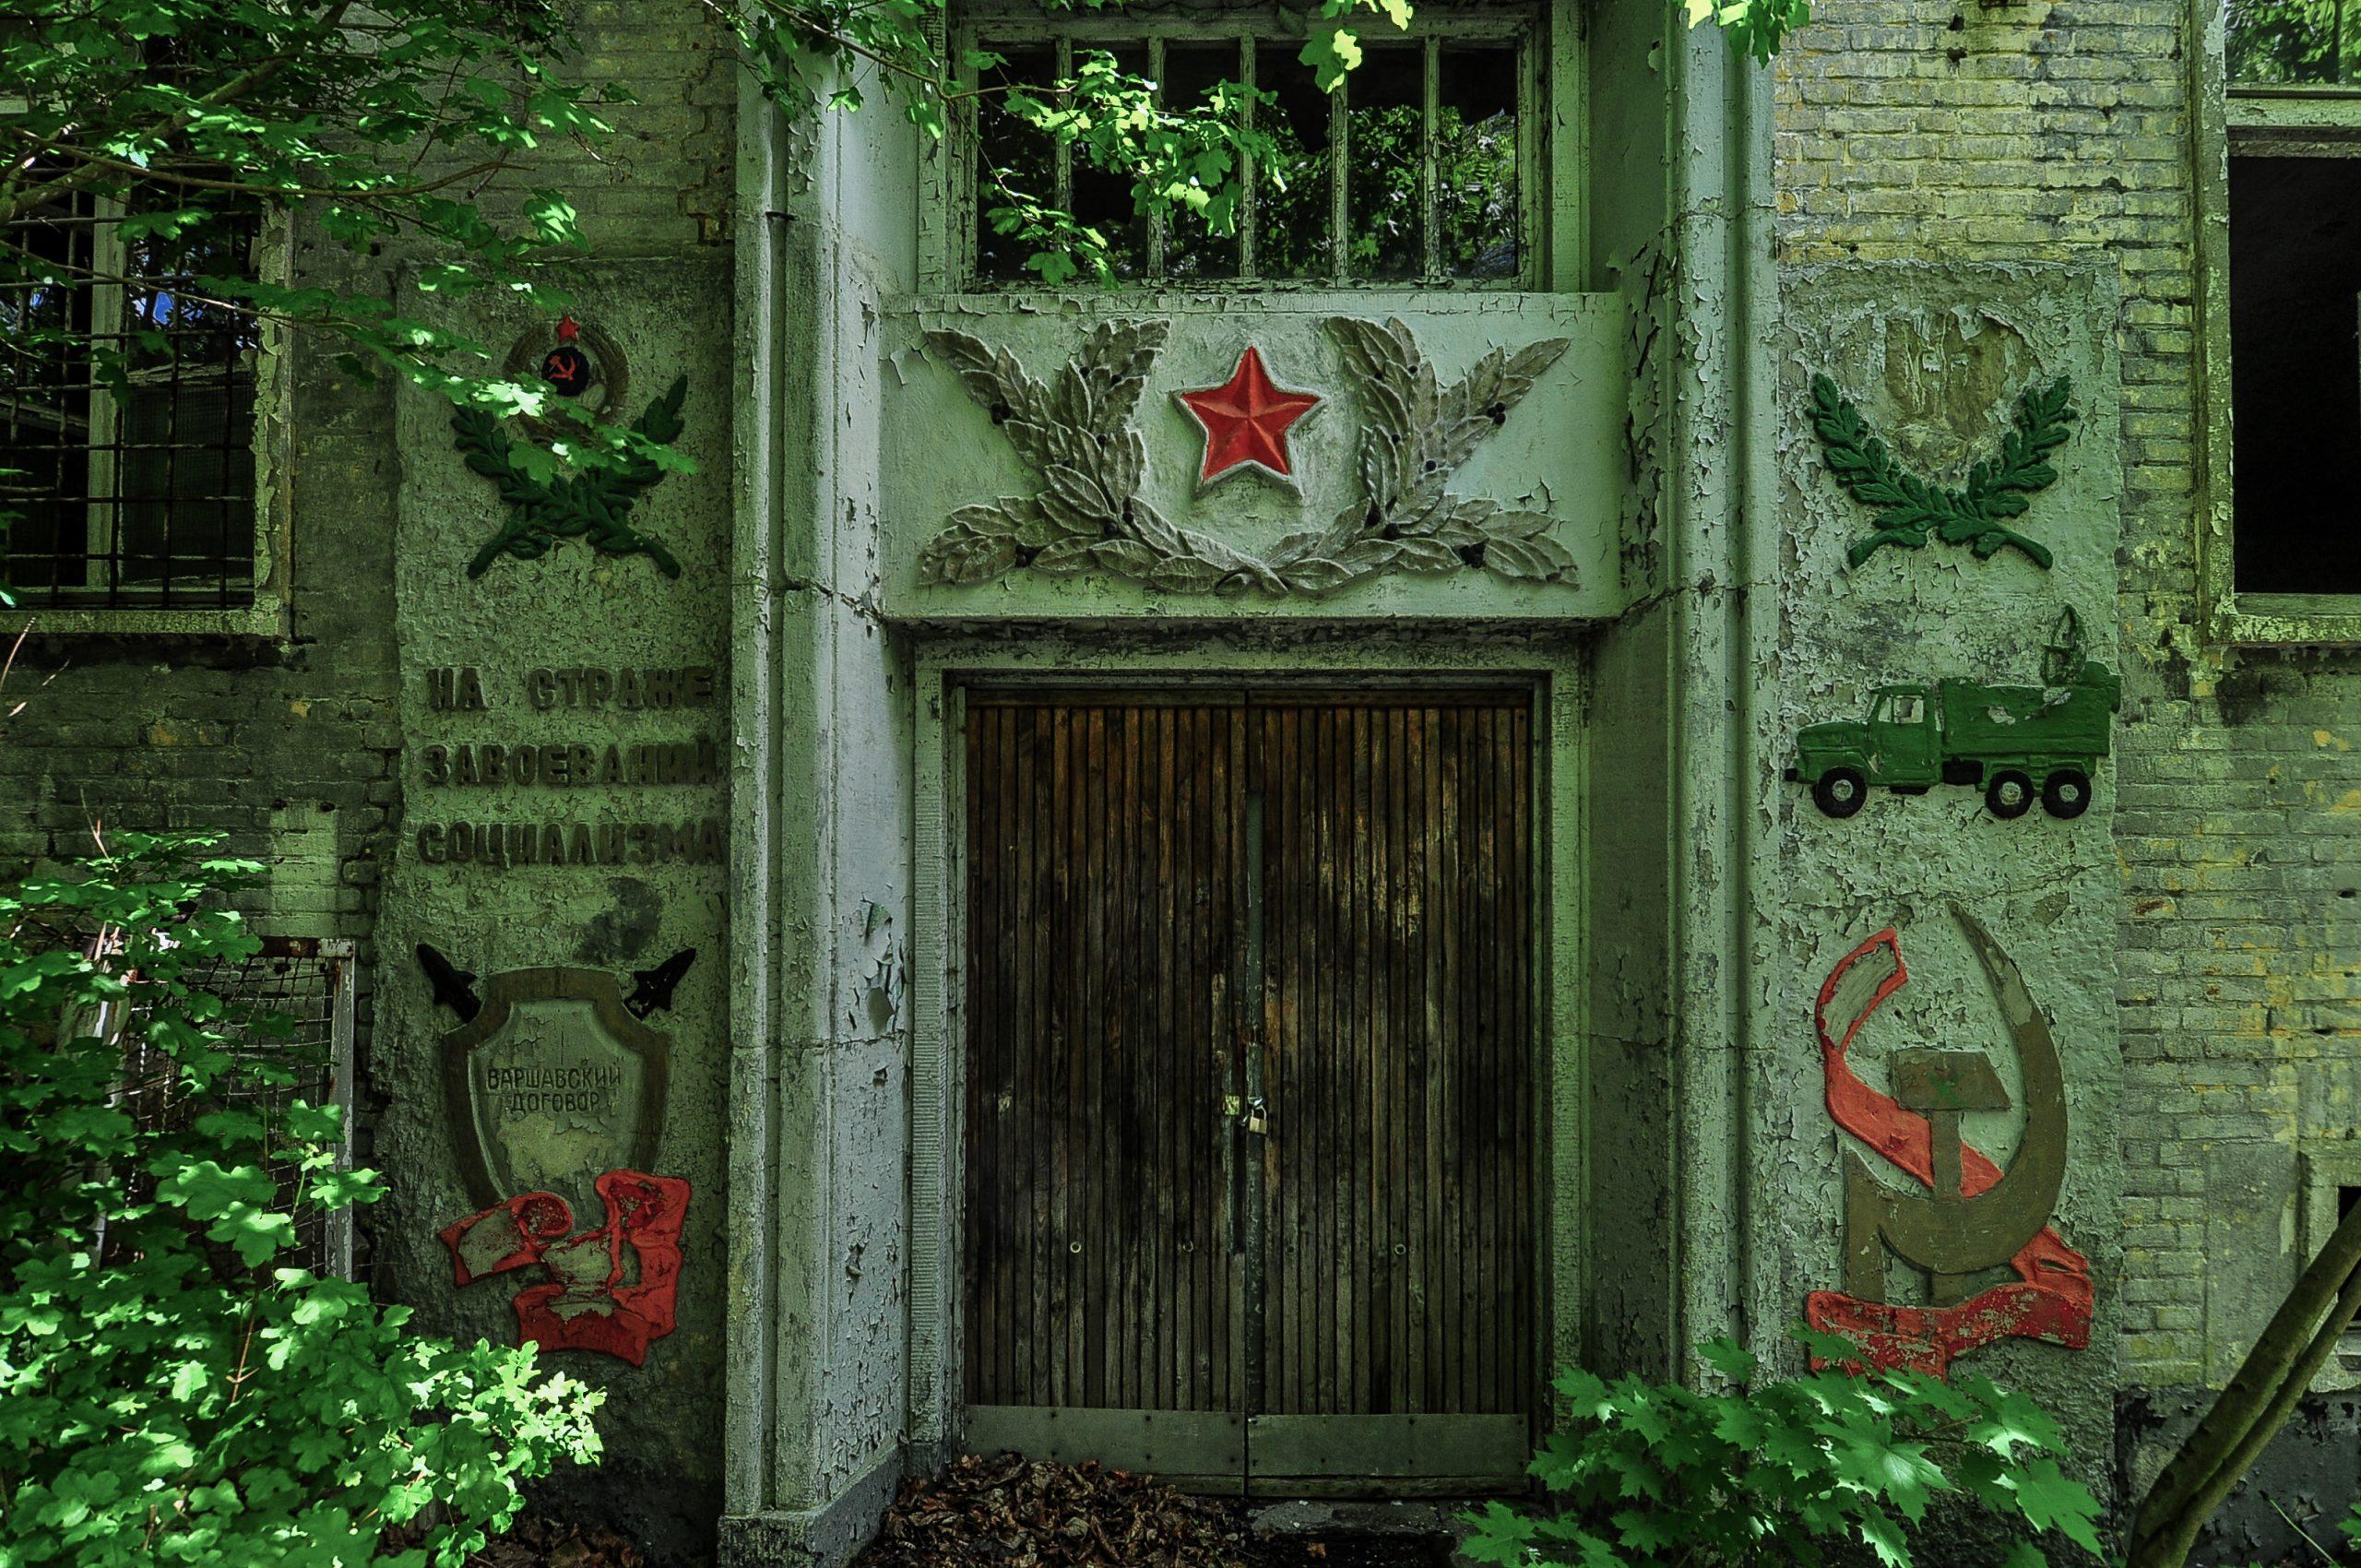 soviet entrance door murals kaserne krampnitz abandoned potsdam berlin Kavallerieschule barracks Panzertruppenschule nazi soviet military base germany deutschland